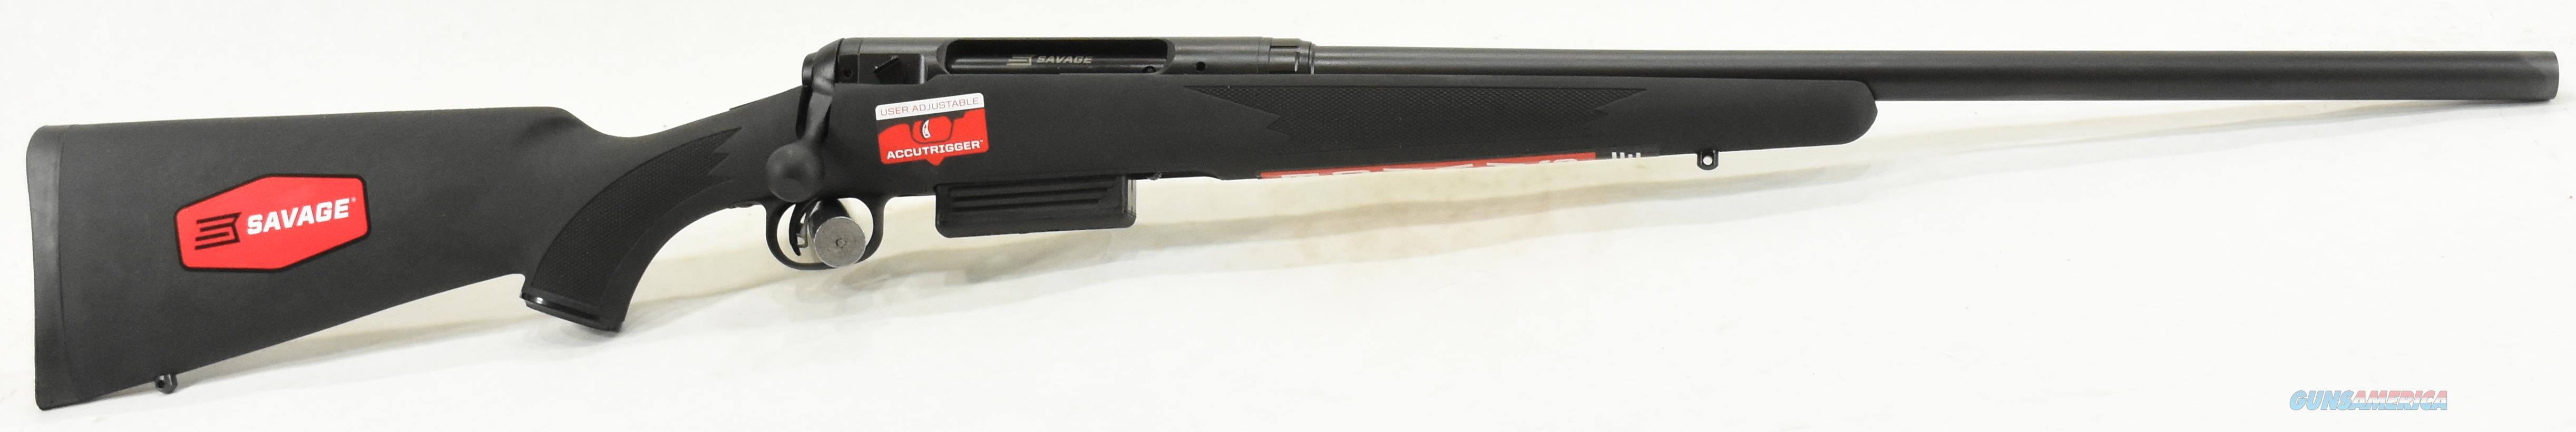 220 Slug Gun Black Syn 20Ga 22-3In 18827  Guns > Rifles > Savage Rifles > Accutrigger Models > Sporting